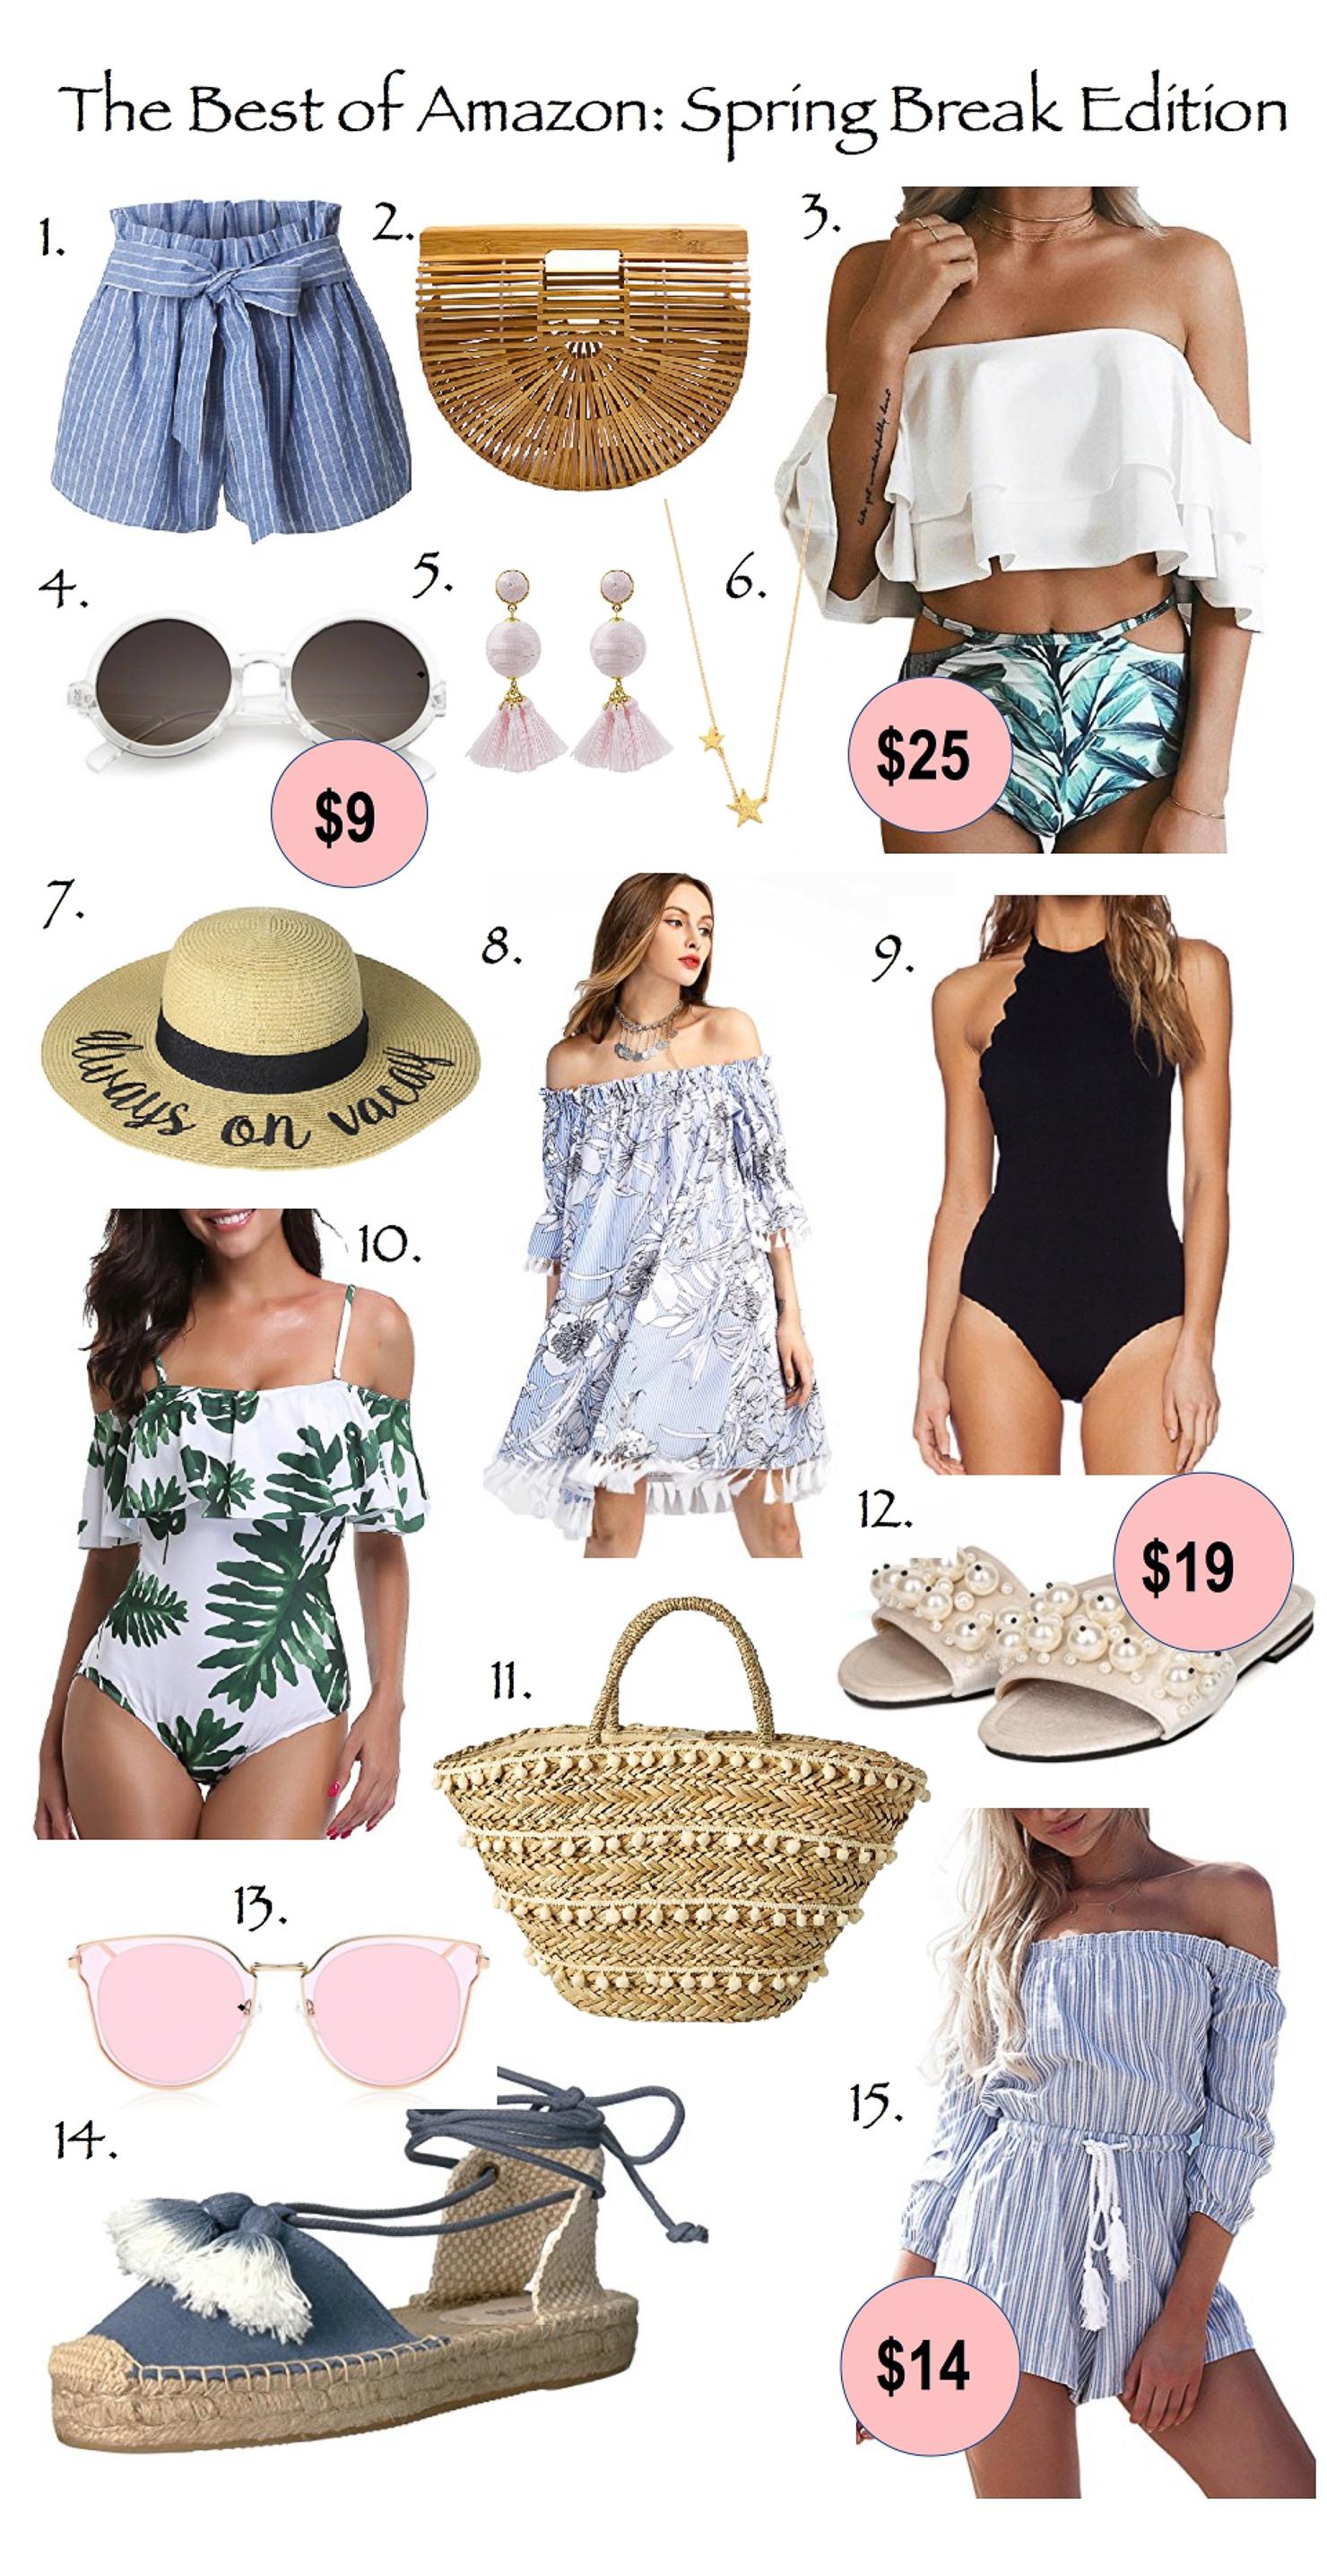 The Best Amazon Spring Break Finds, best of amazon spring break, amazon prime best buys